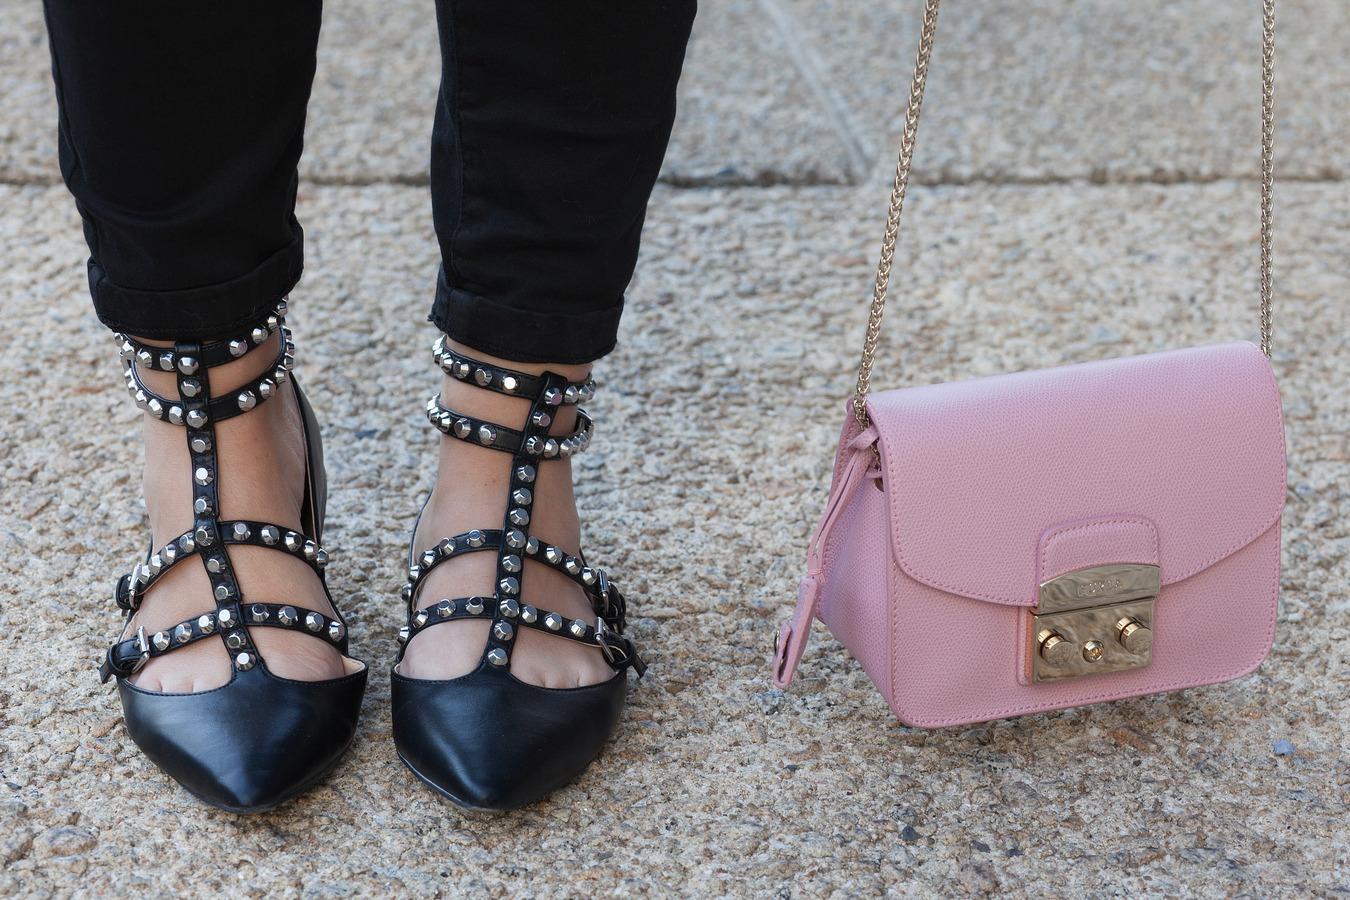 Blog mode Paris - Du style, Madame !